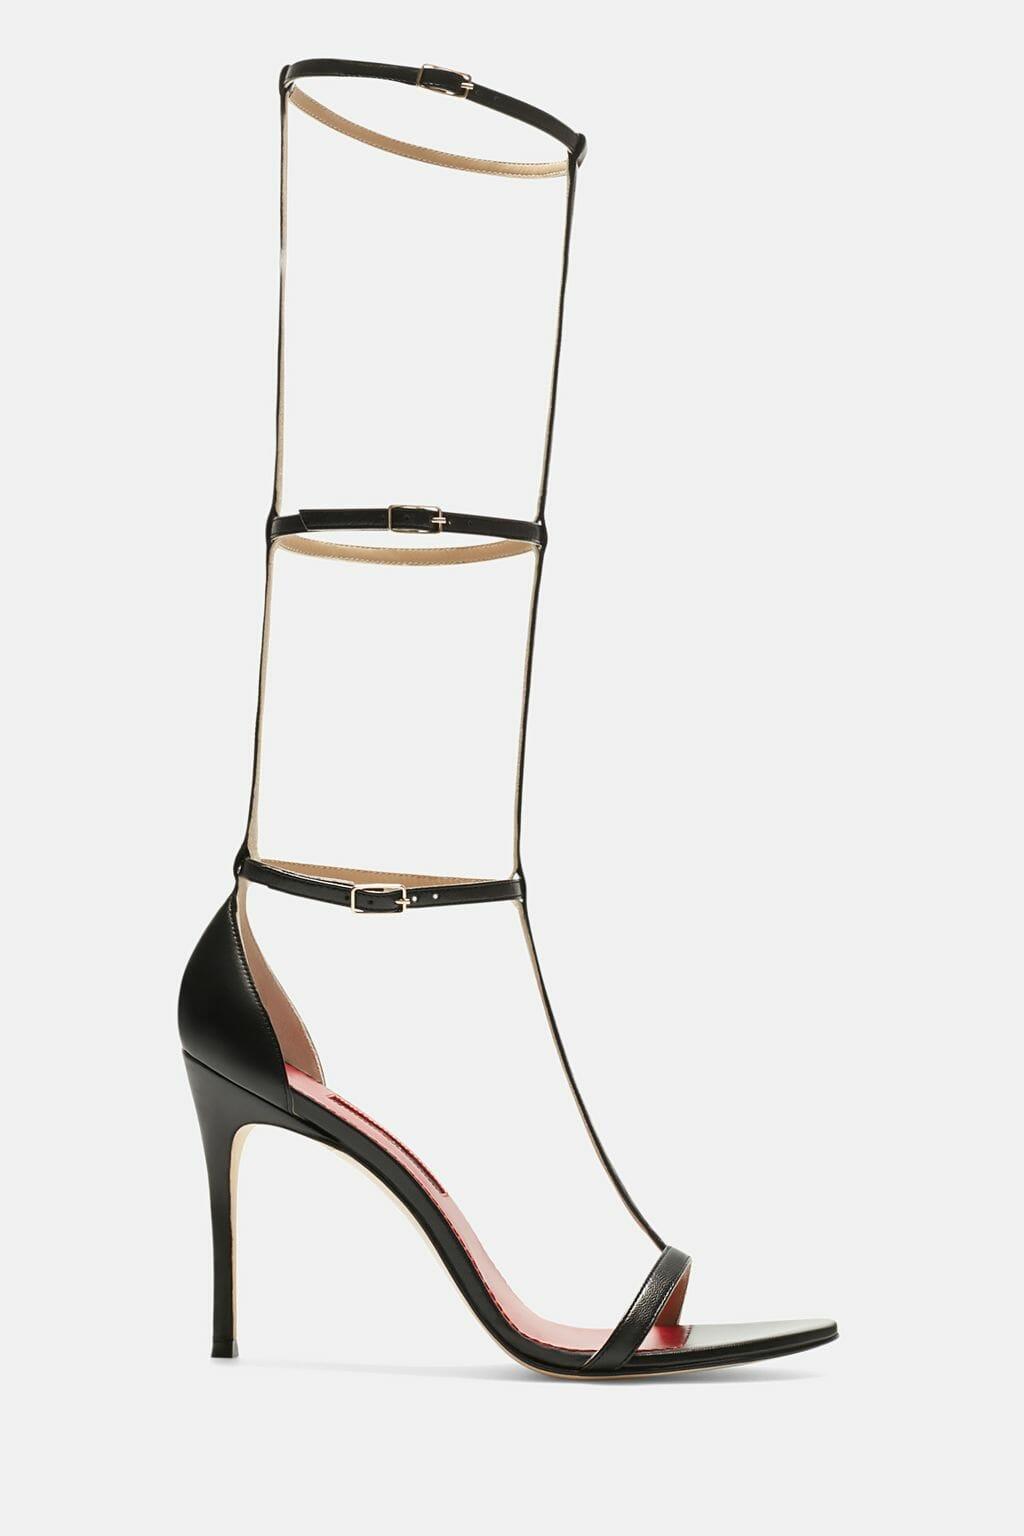 CH-Carolina-herrera-shoes-collection-Spring-Summer-2018-shoe-0